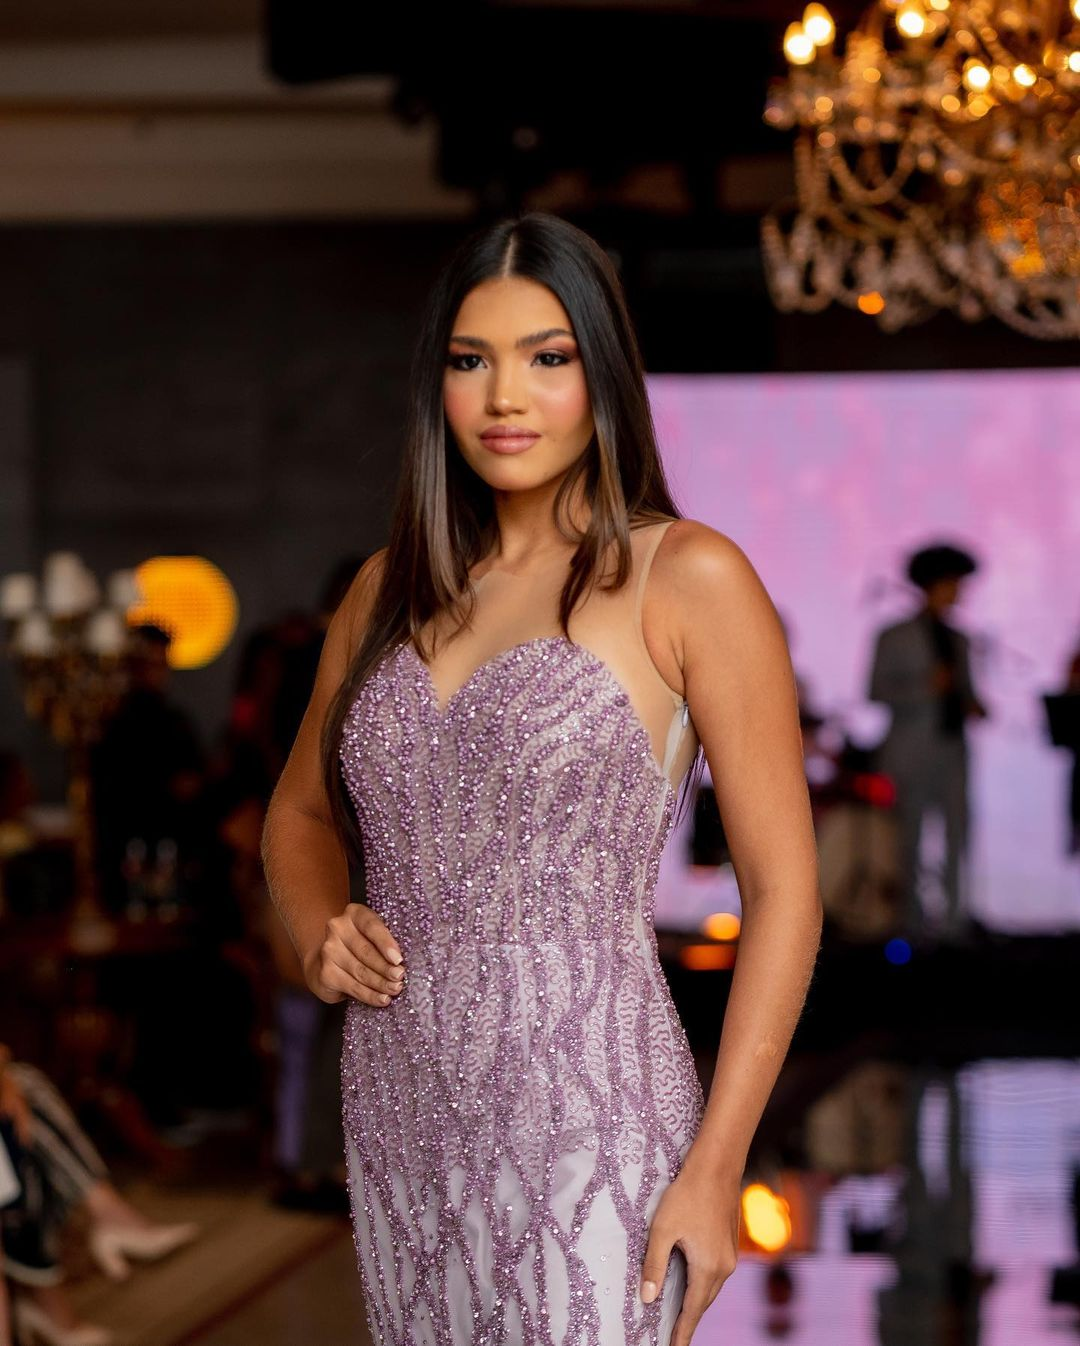 maiza santa rita, top 10 de miss brasil mundo 2019. - Página 2 69152918